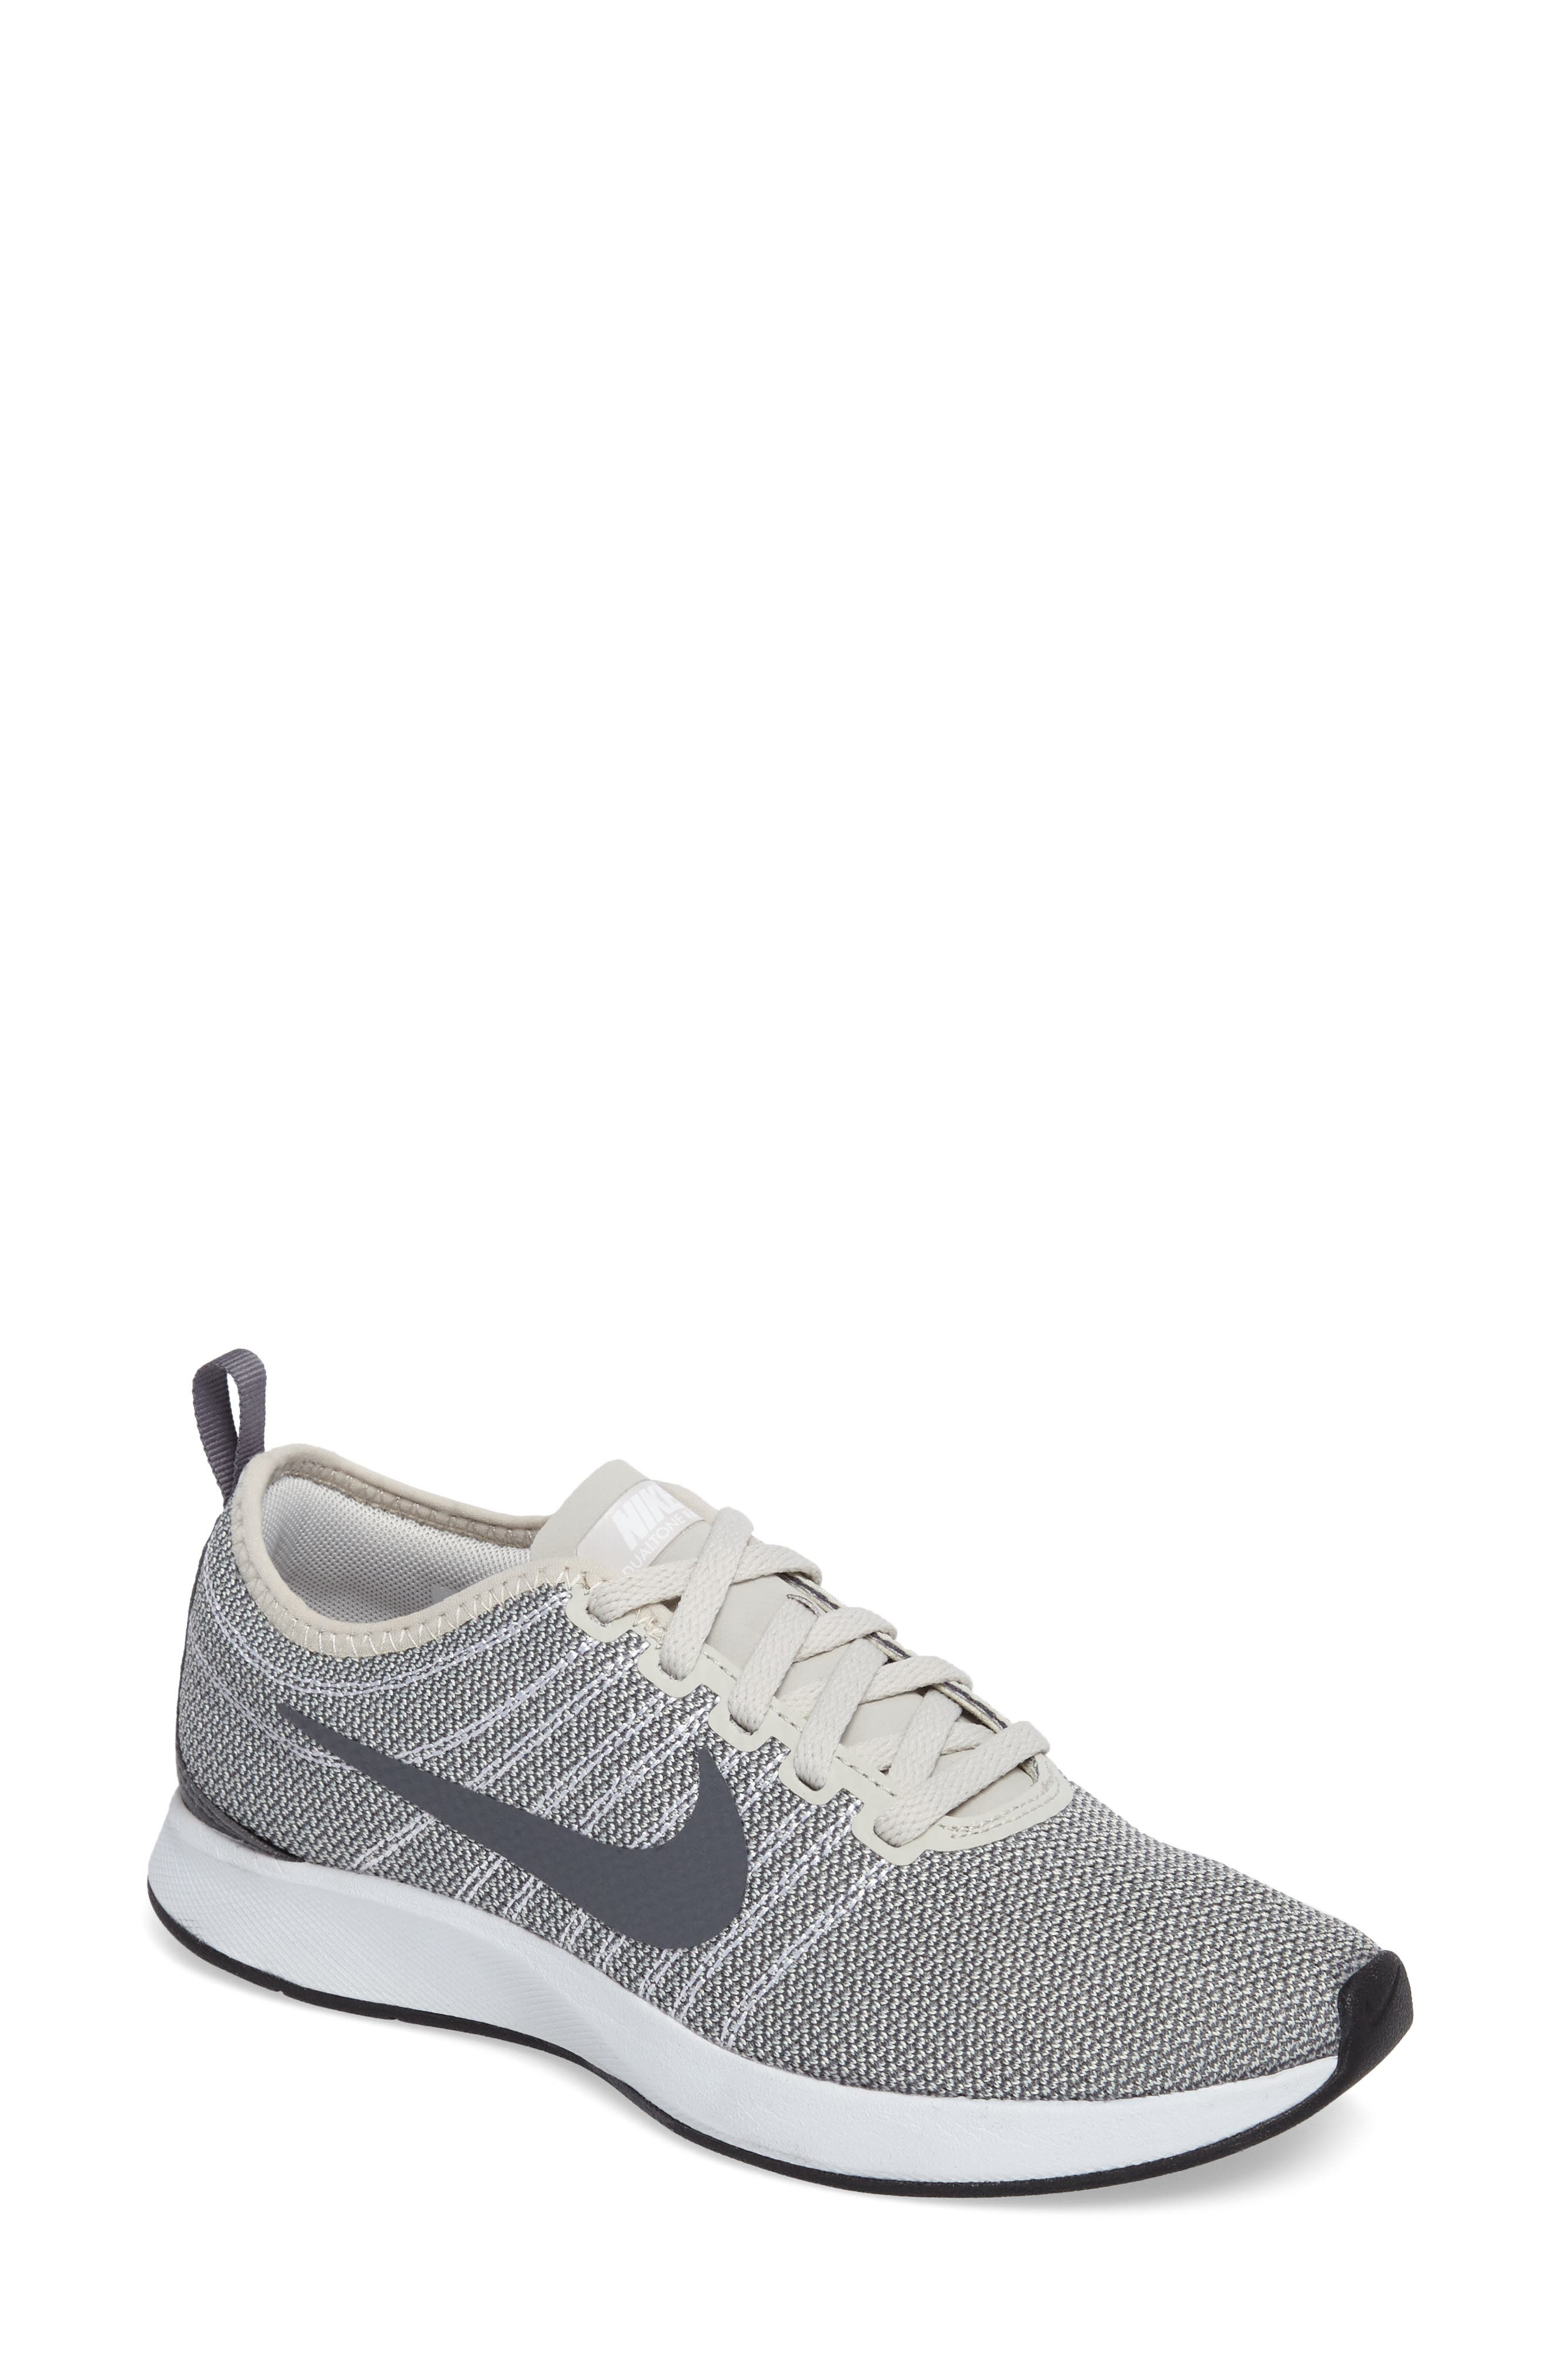 Dualtone Racer Running Shoe,                             Main thumbnail 1, color,                             Light Bone/ White/ Dark Grey